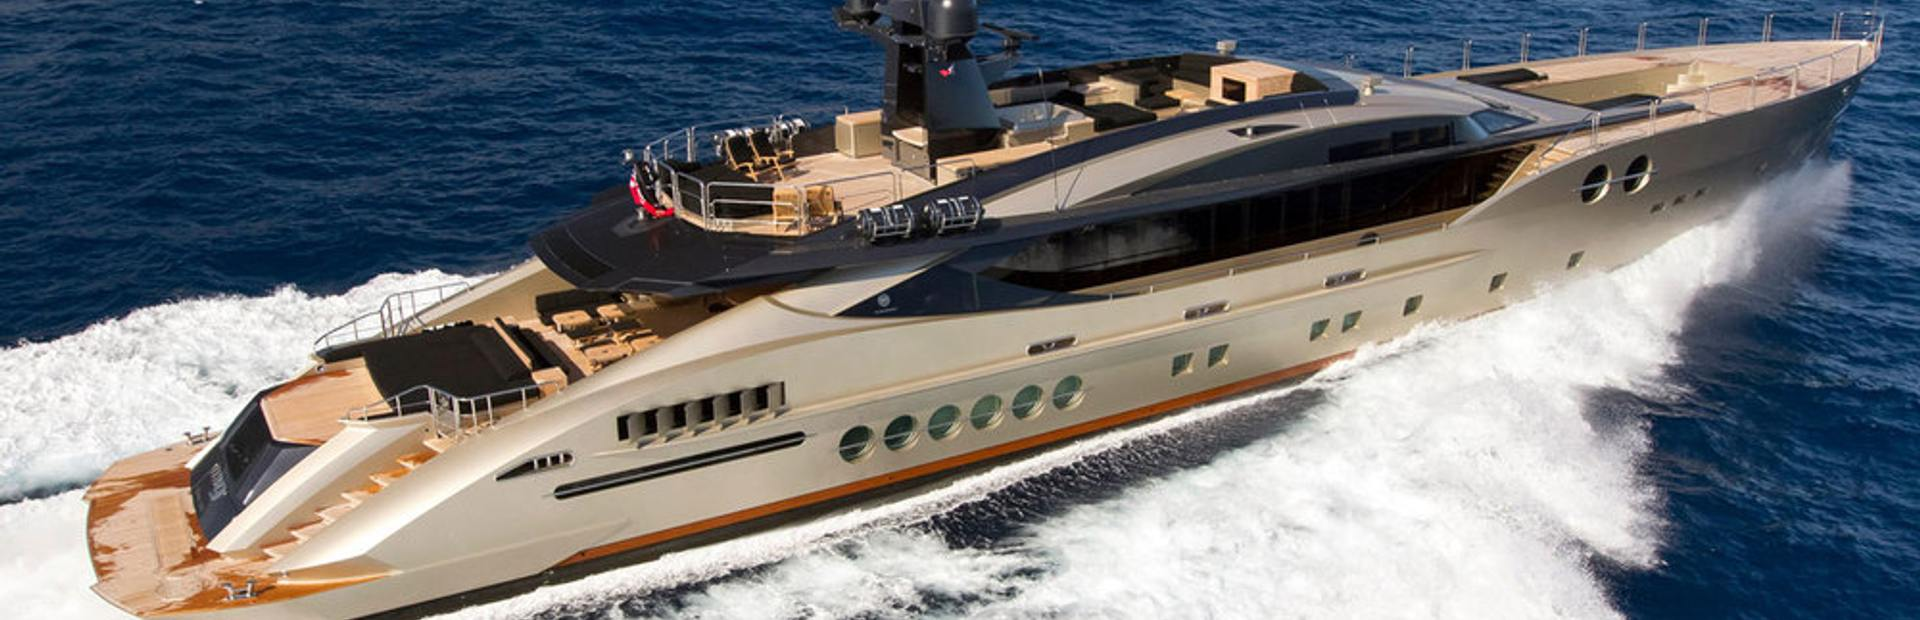 Palmer Johnson PJ 170 Yacht Charter